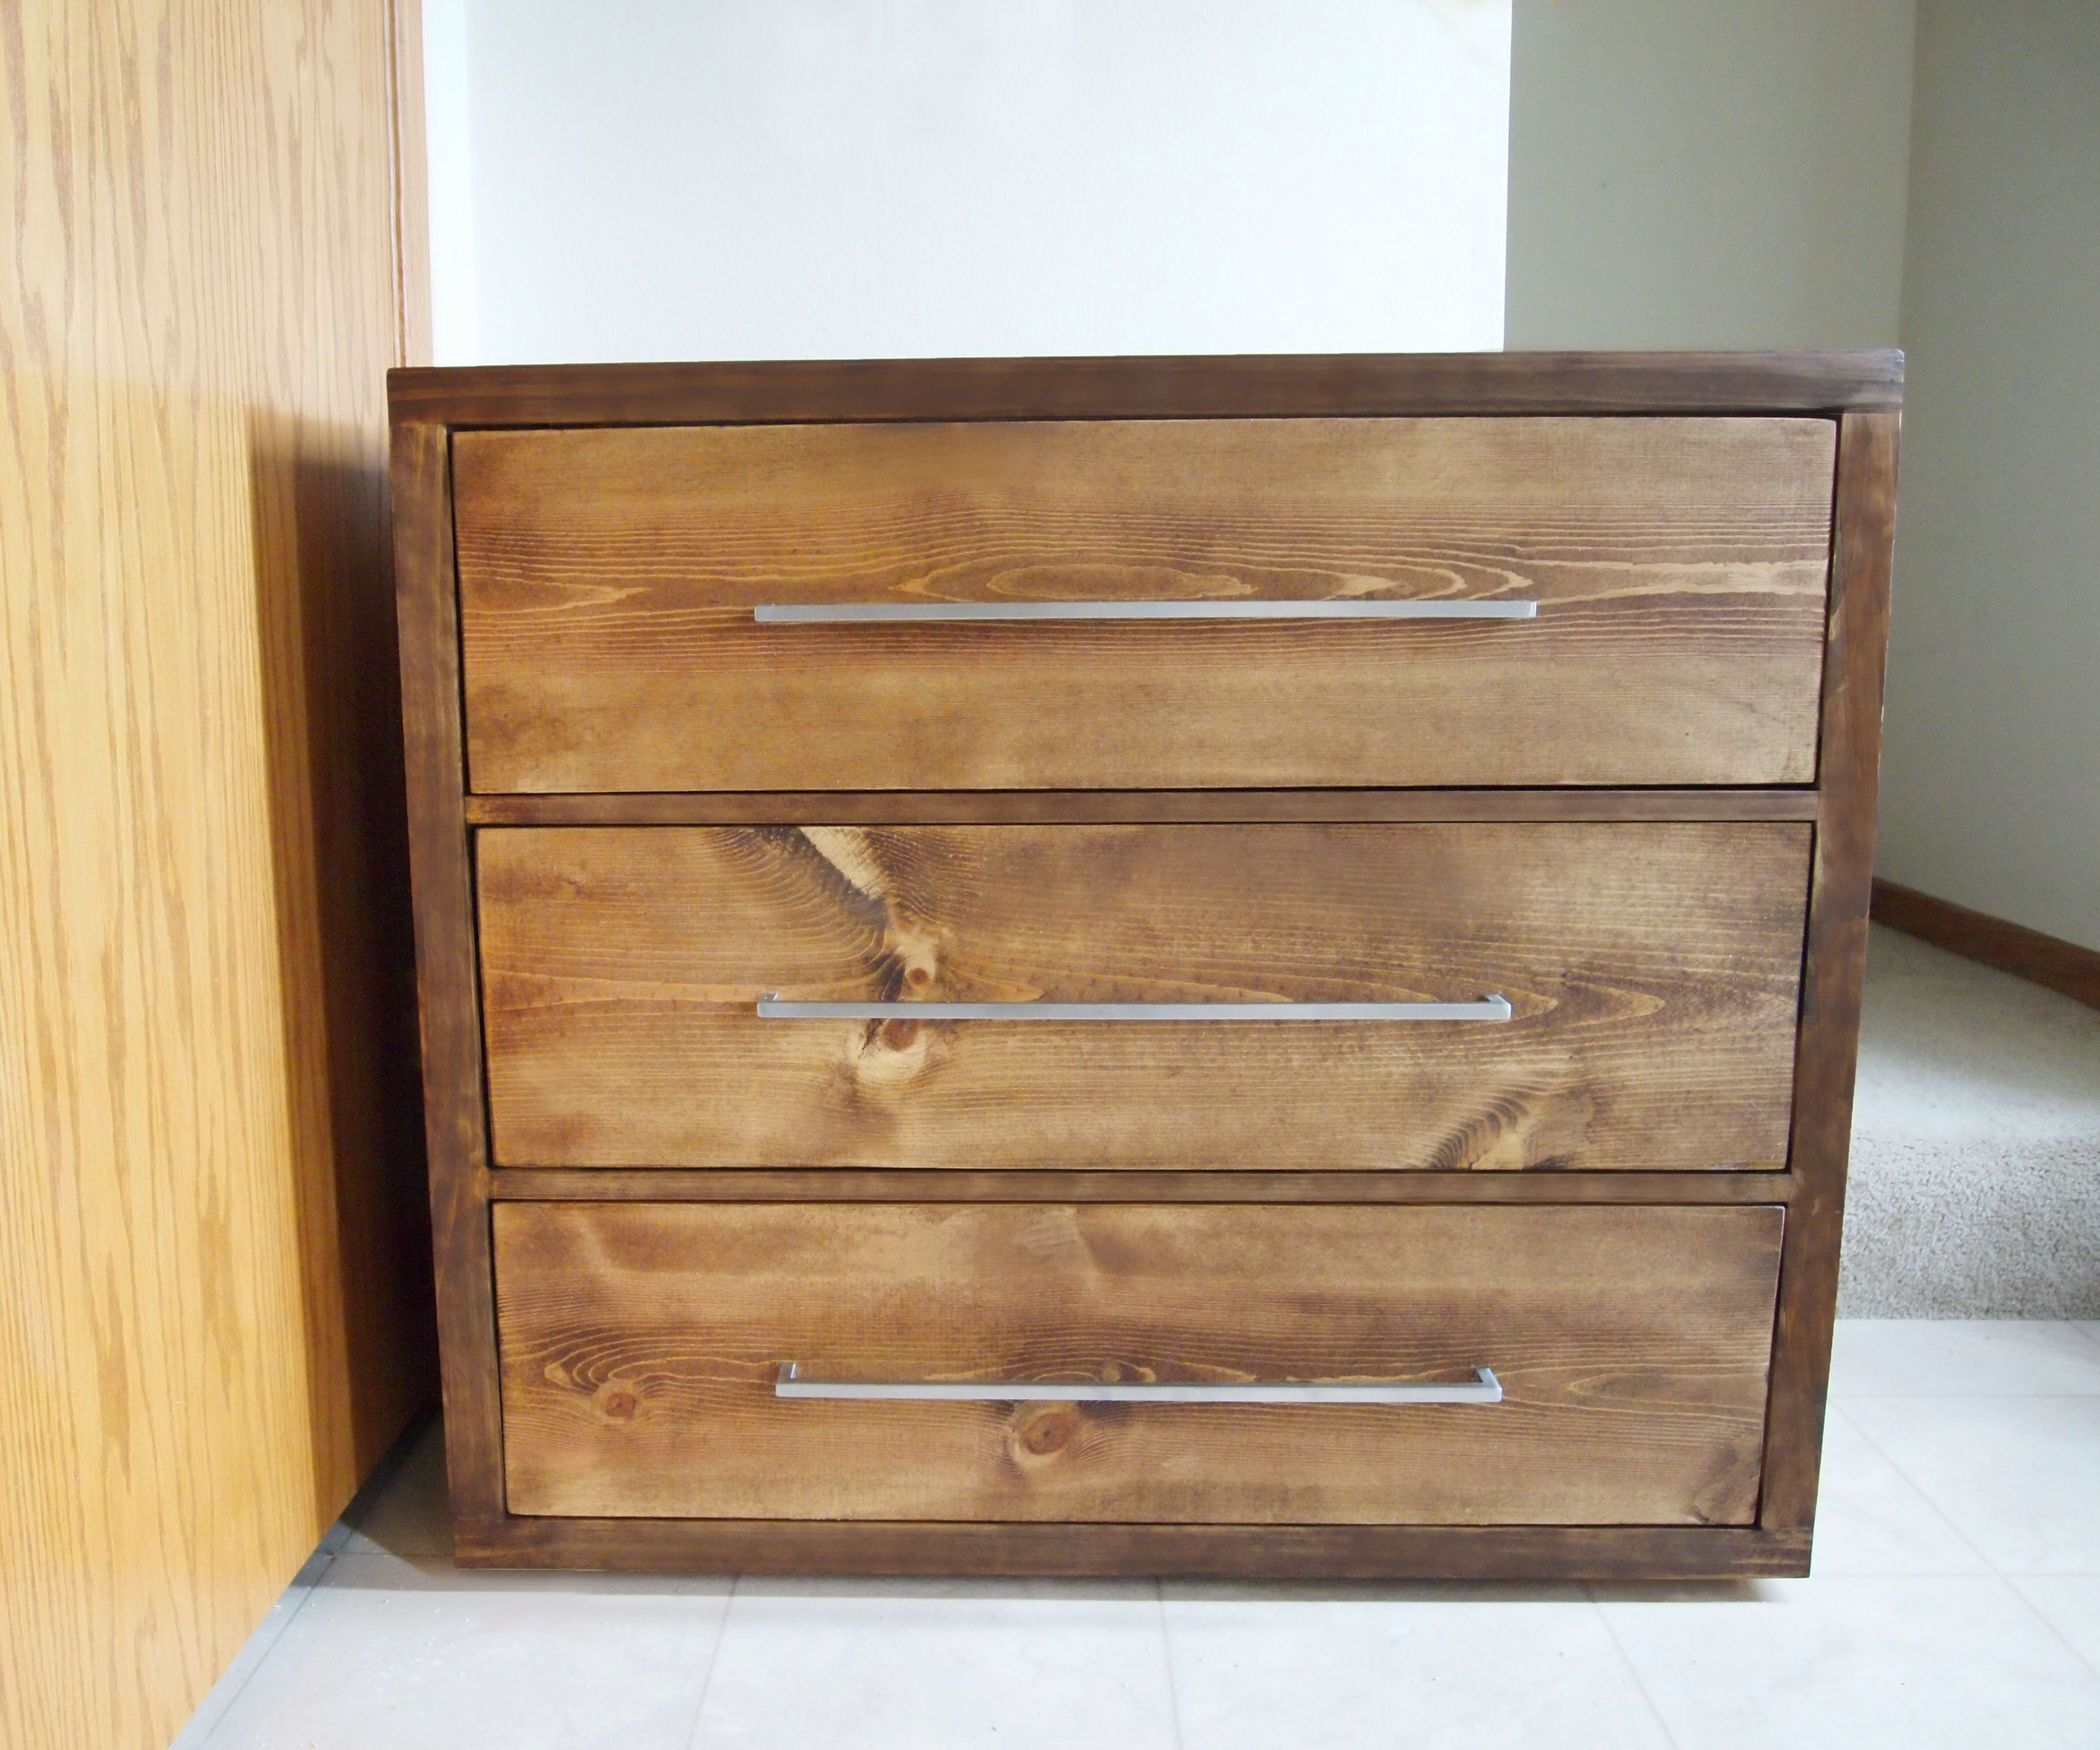 How To Build A Modern Dresser With Few Tools Diy Dresser Build